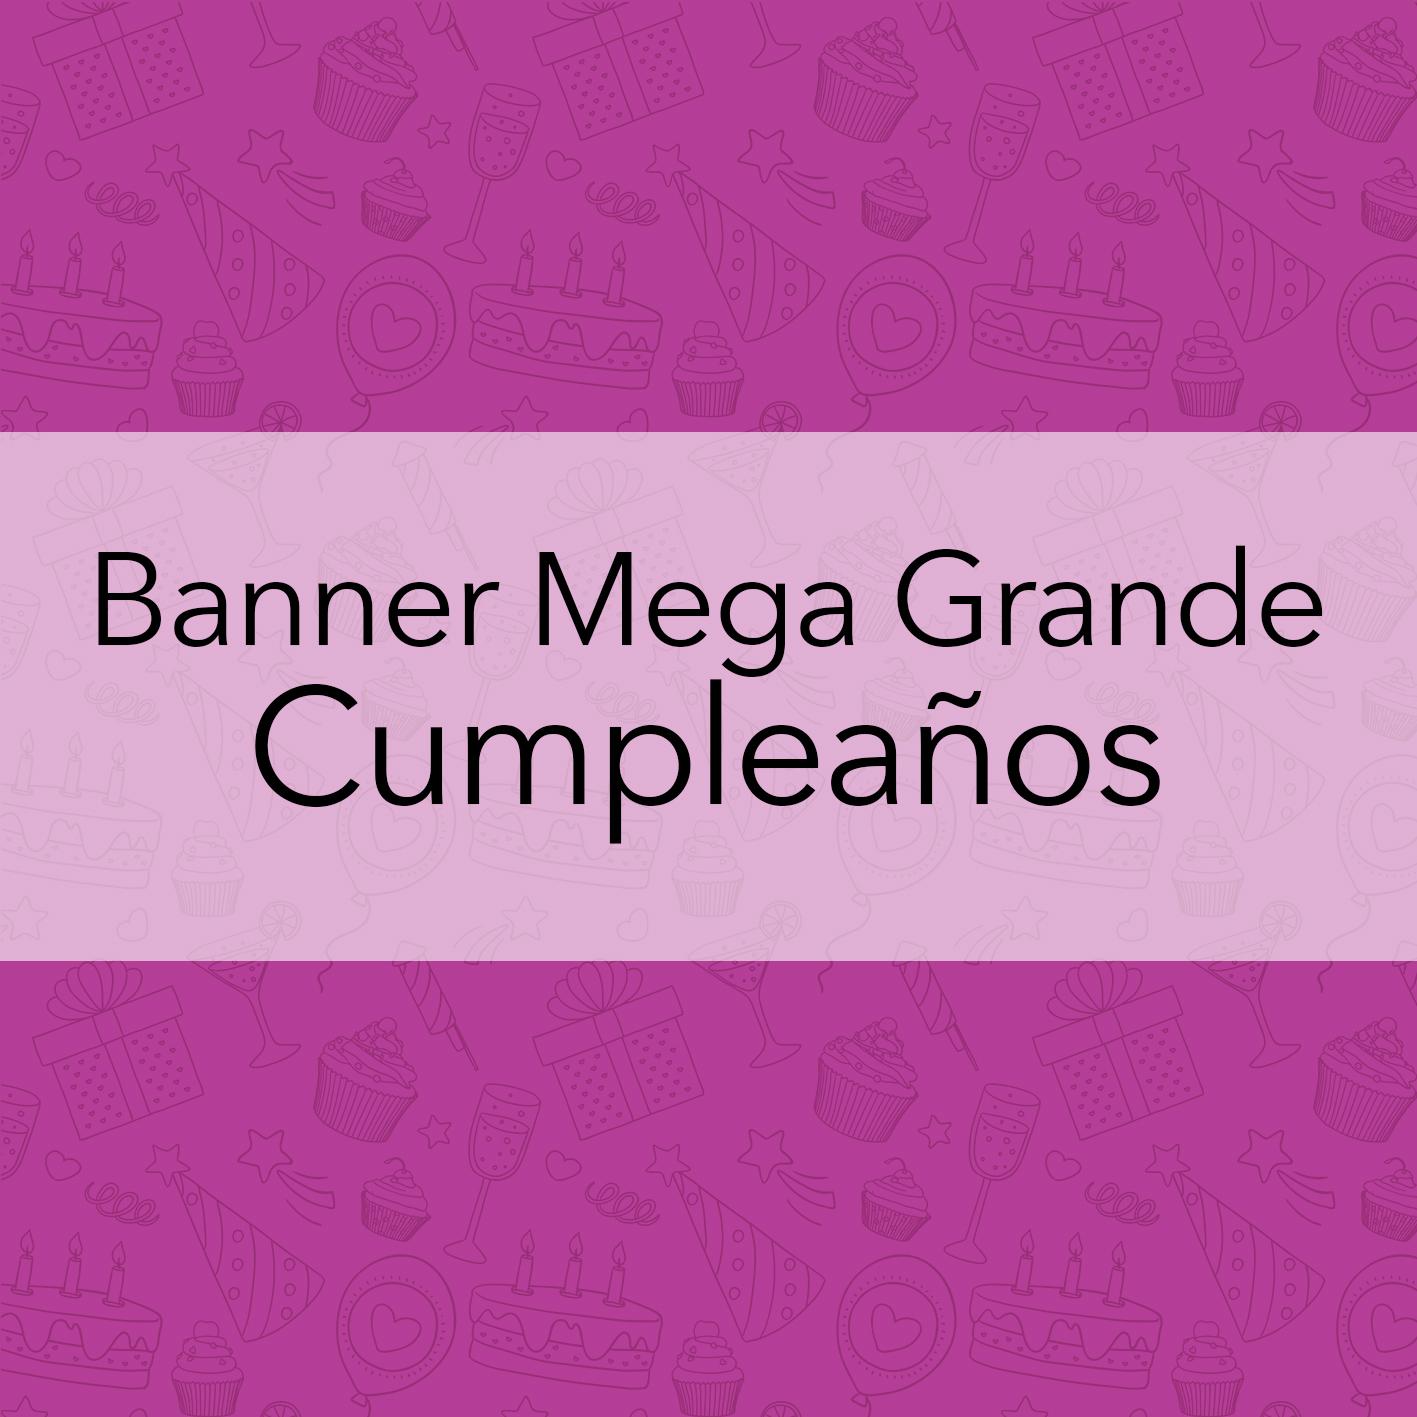 BANNER MEGA GRANDE CUMPLEAÑOS